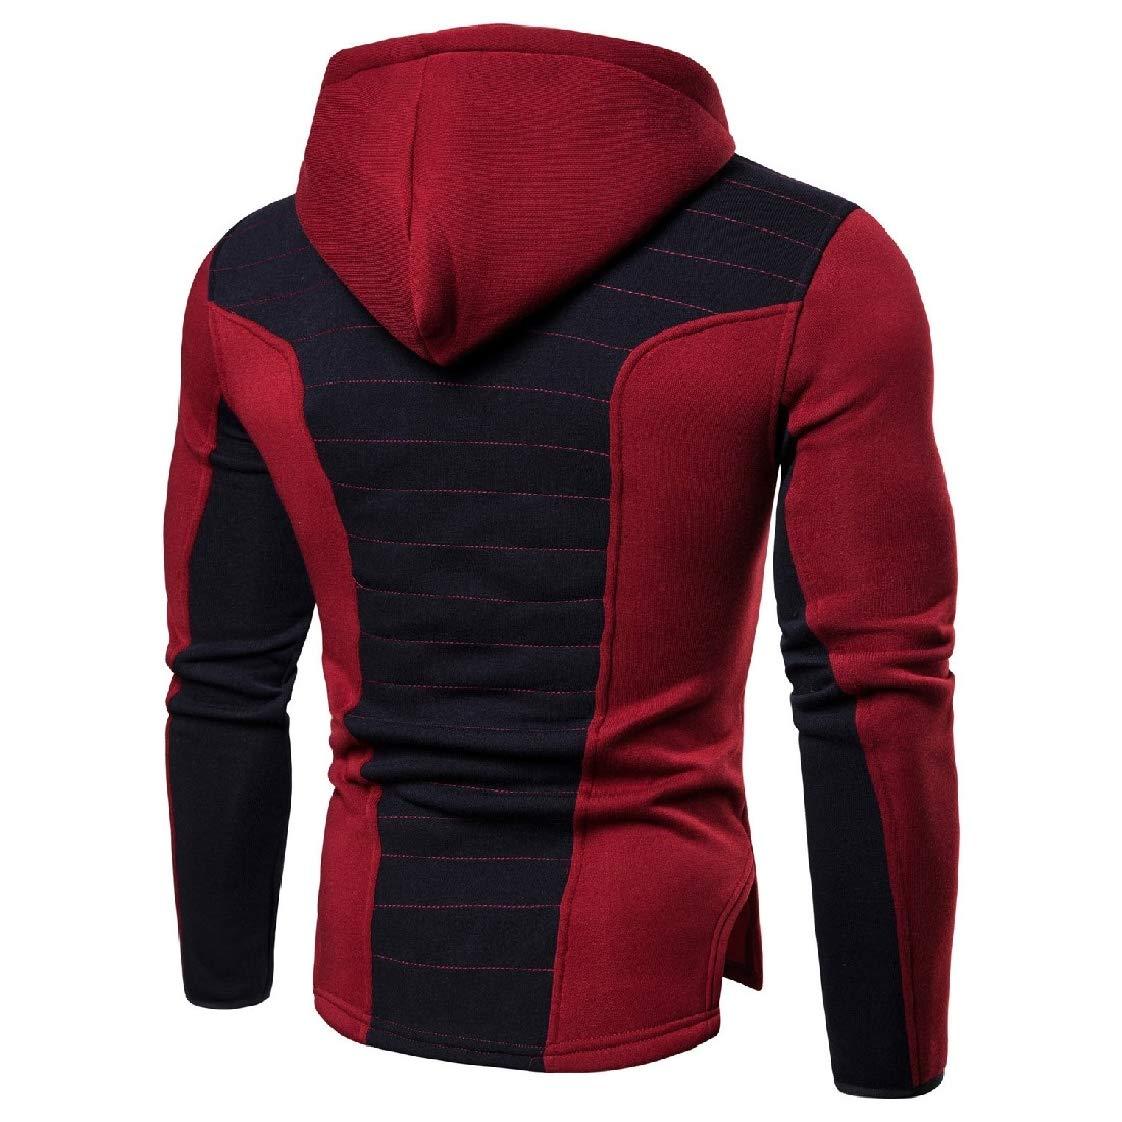 YUNY Men Color Block Full-Zip Sports Hooded Fitness Sweatshirts Outwear Red L